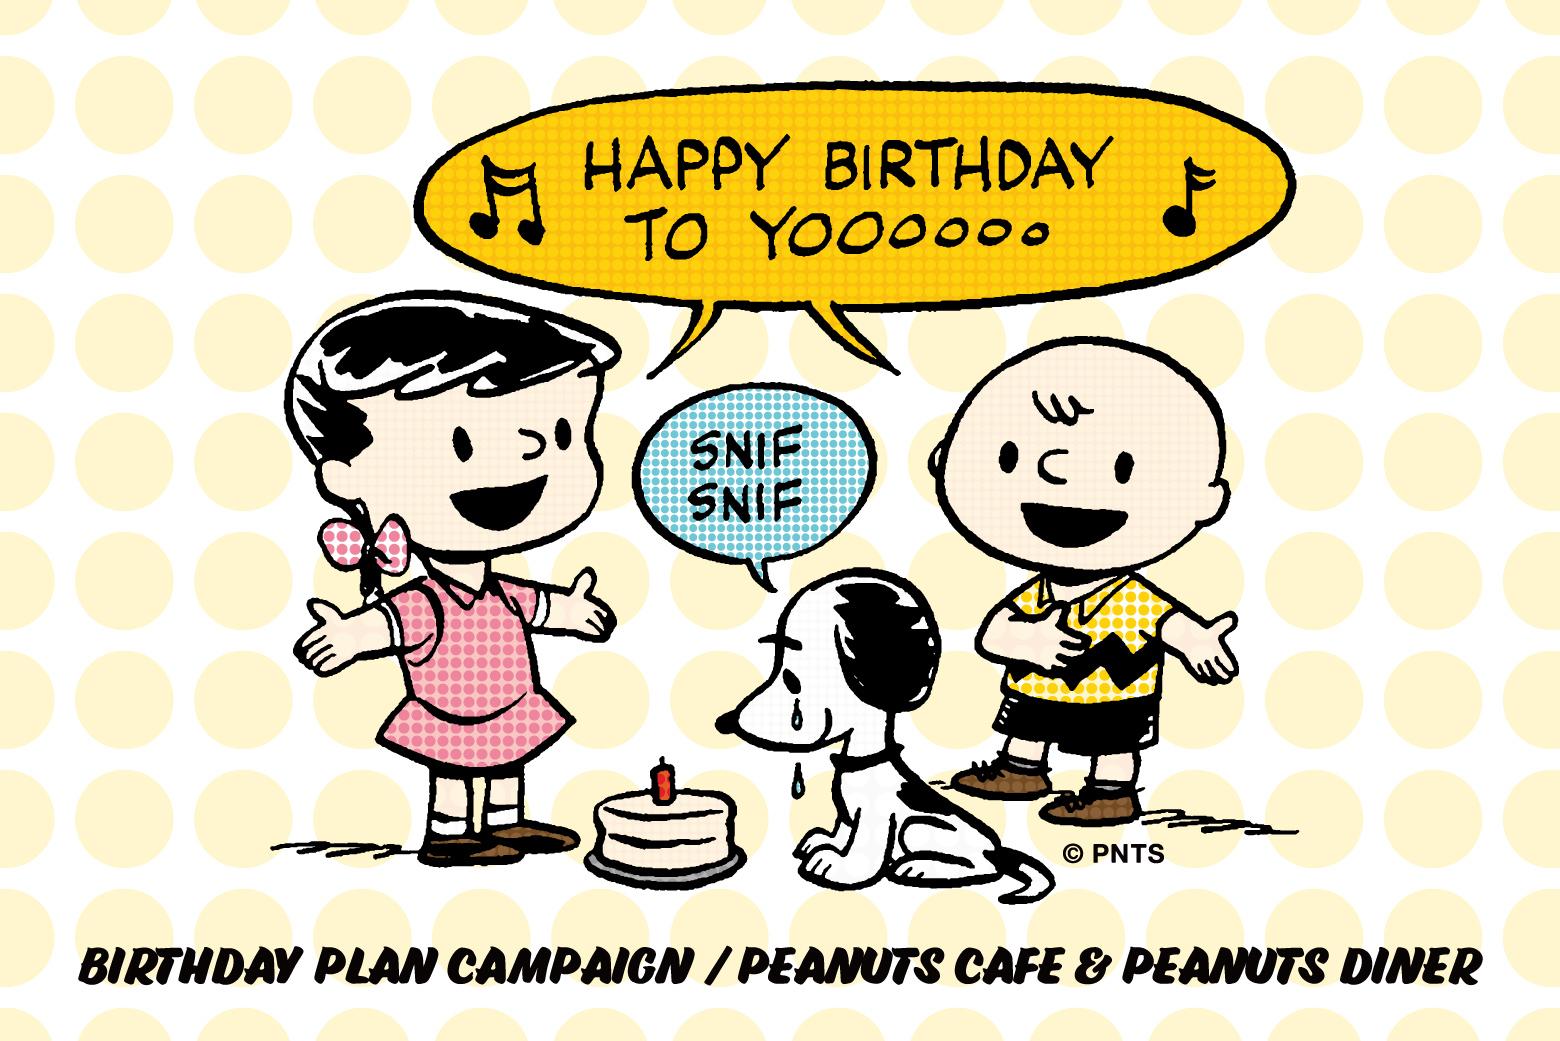 peanuts-cafe-3-3